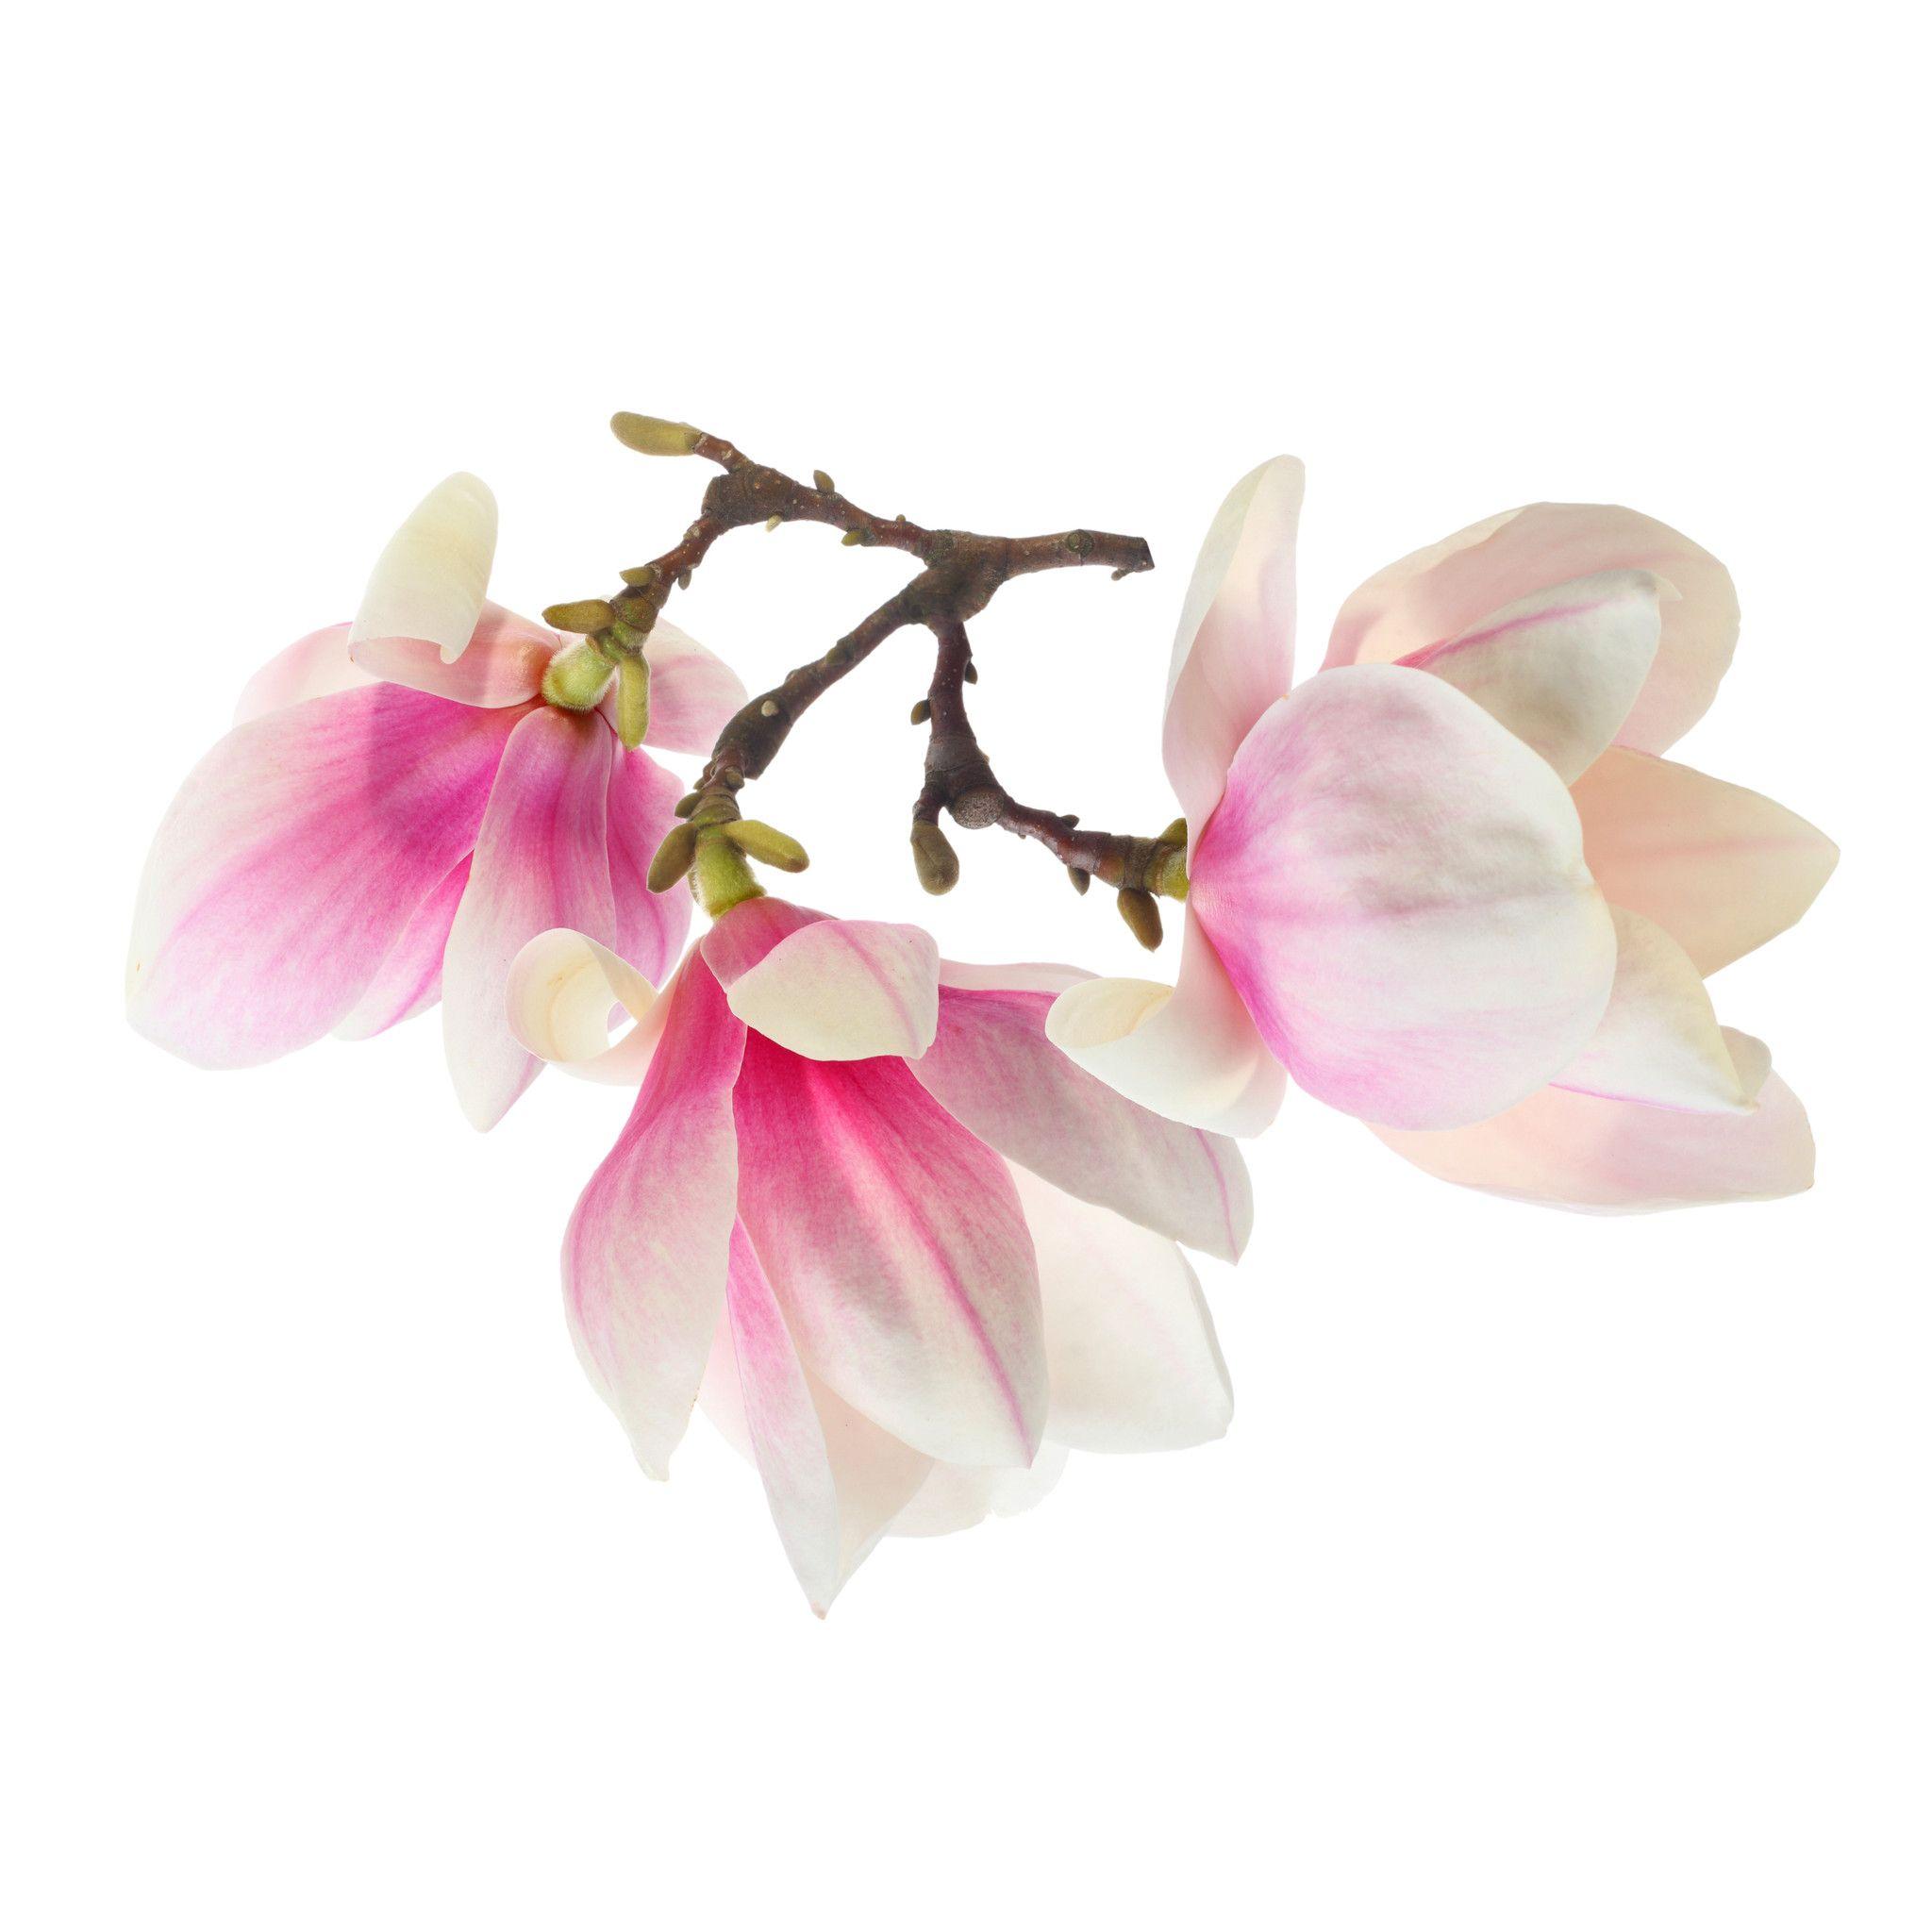 magnolia Google Search Magnolia, Parts of a plant